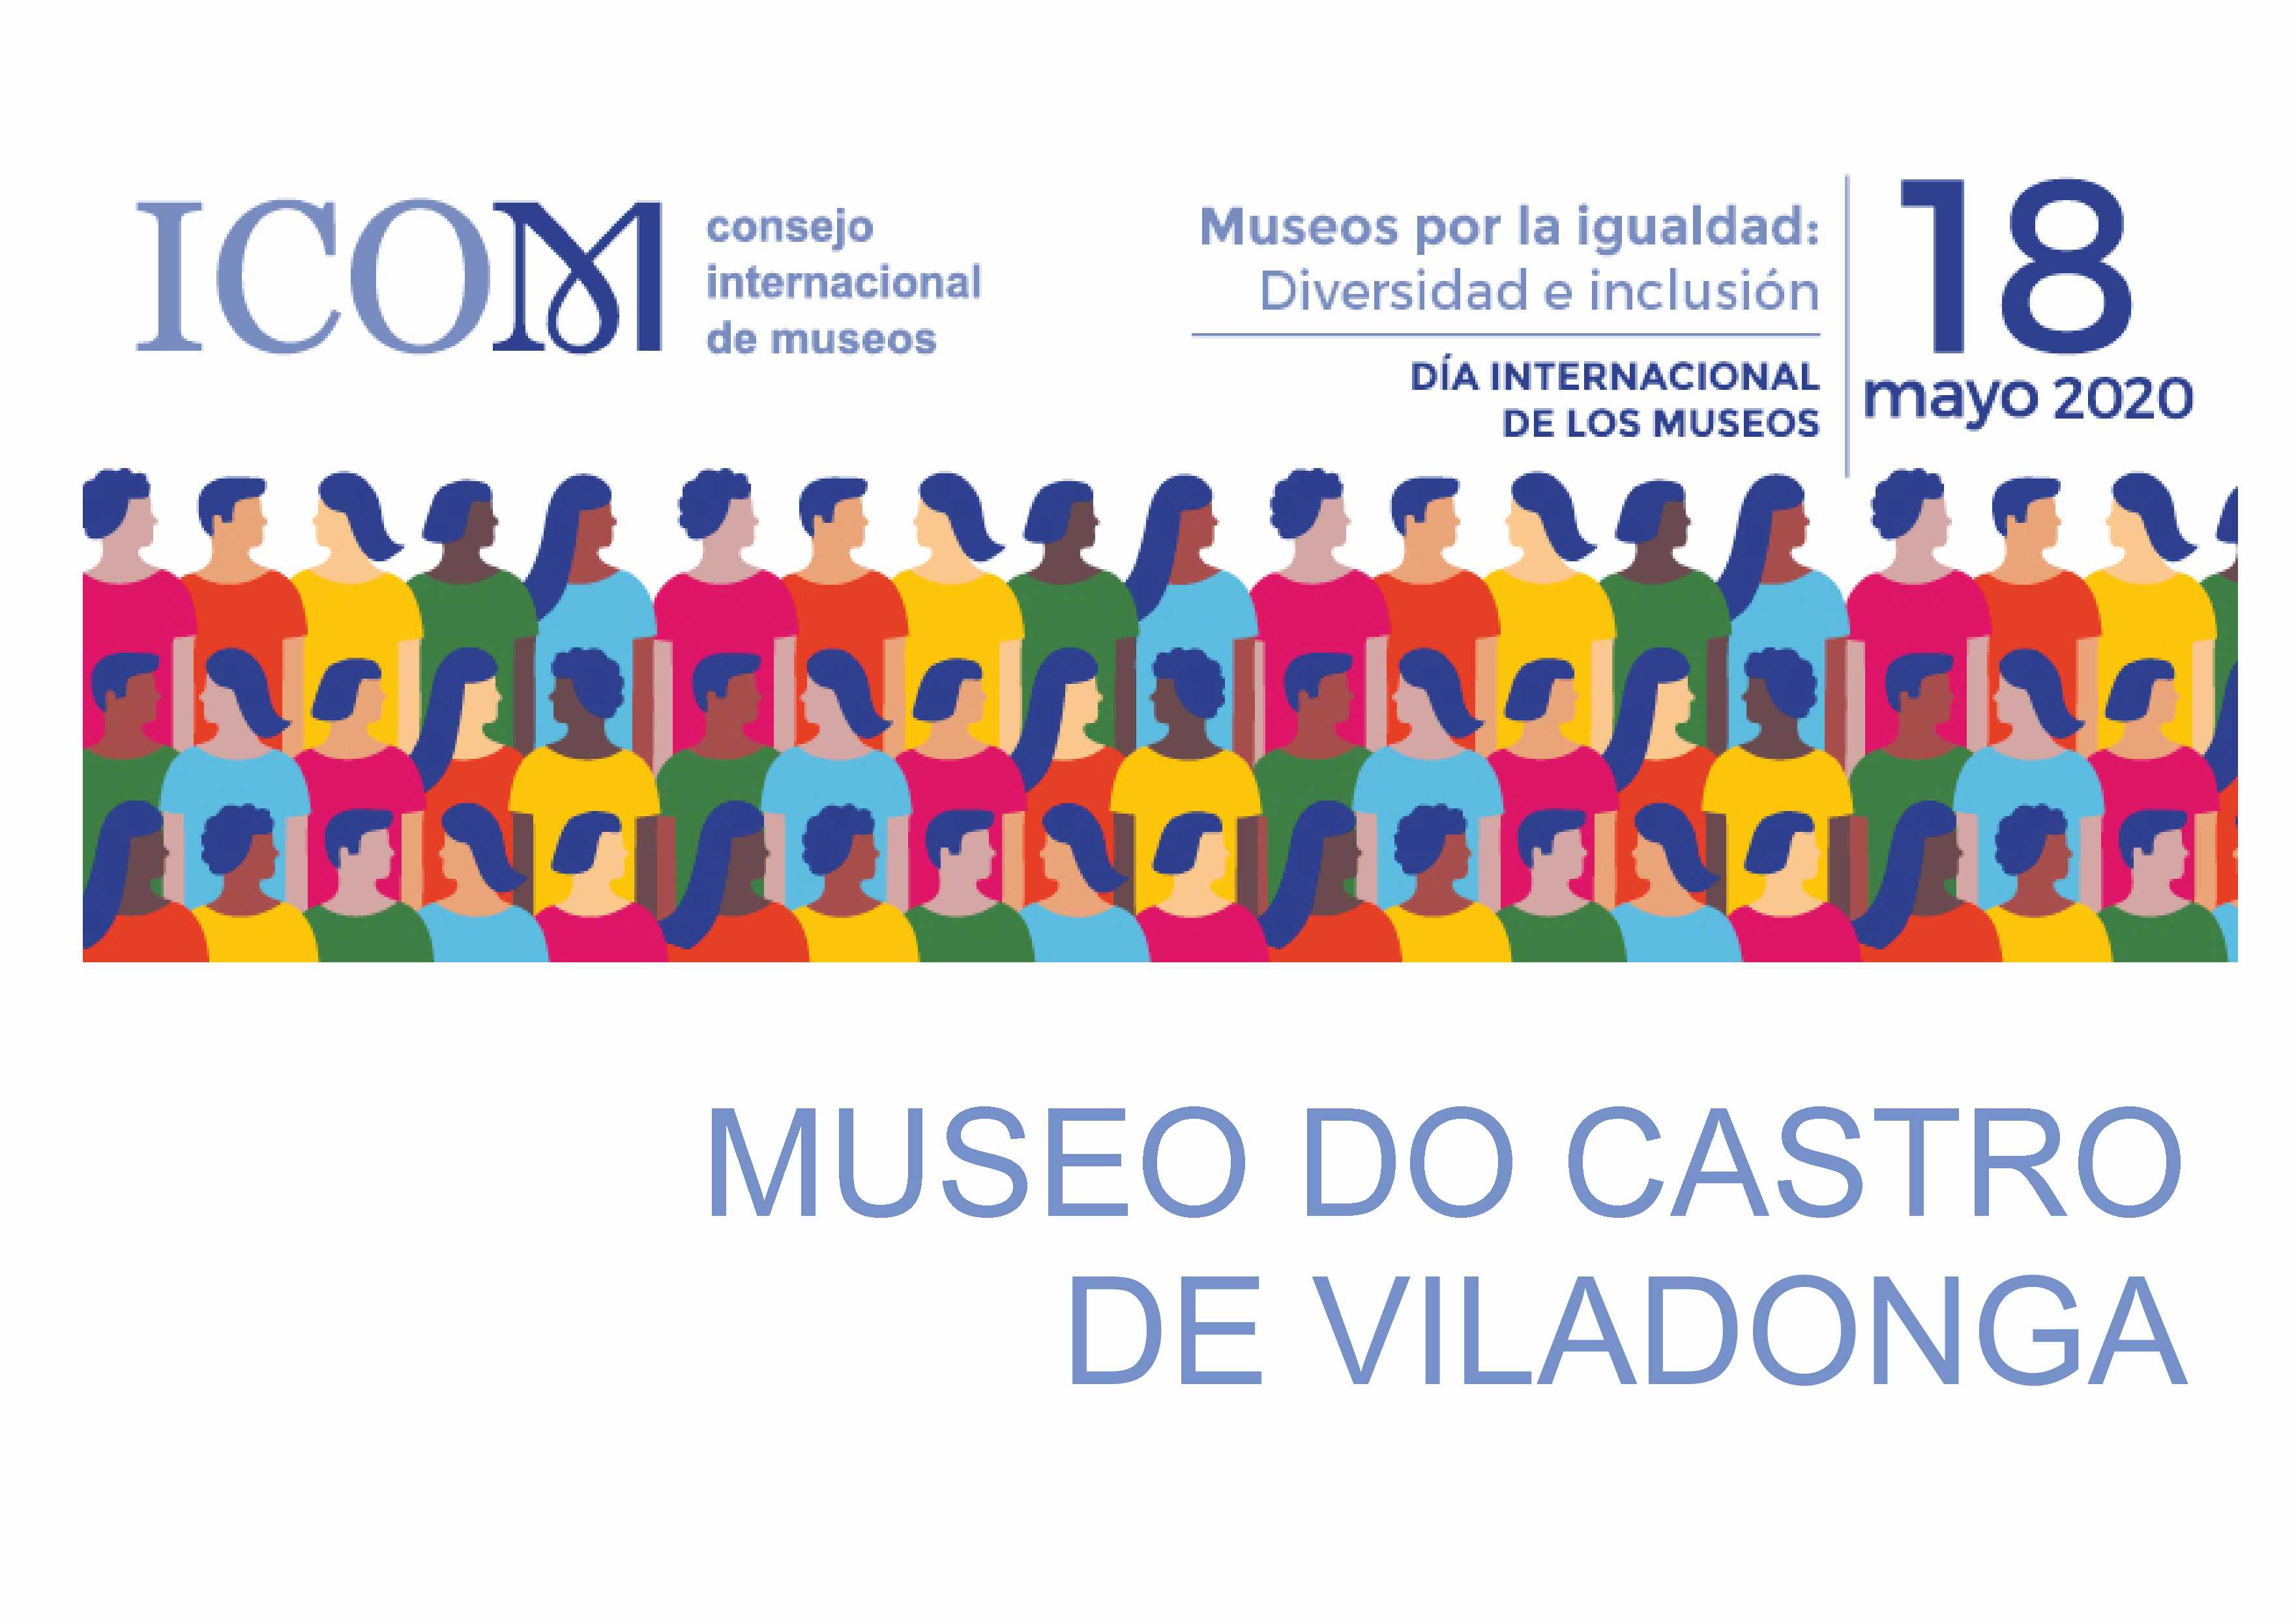 Castro de Viladonga